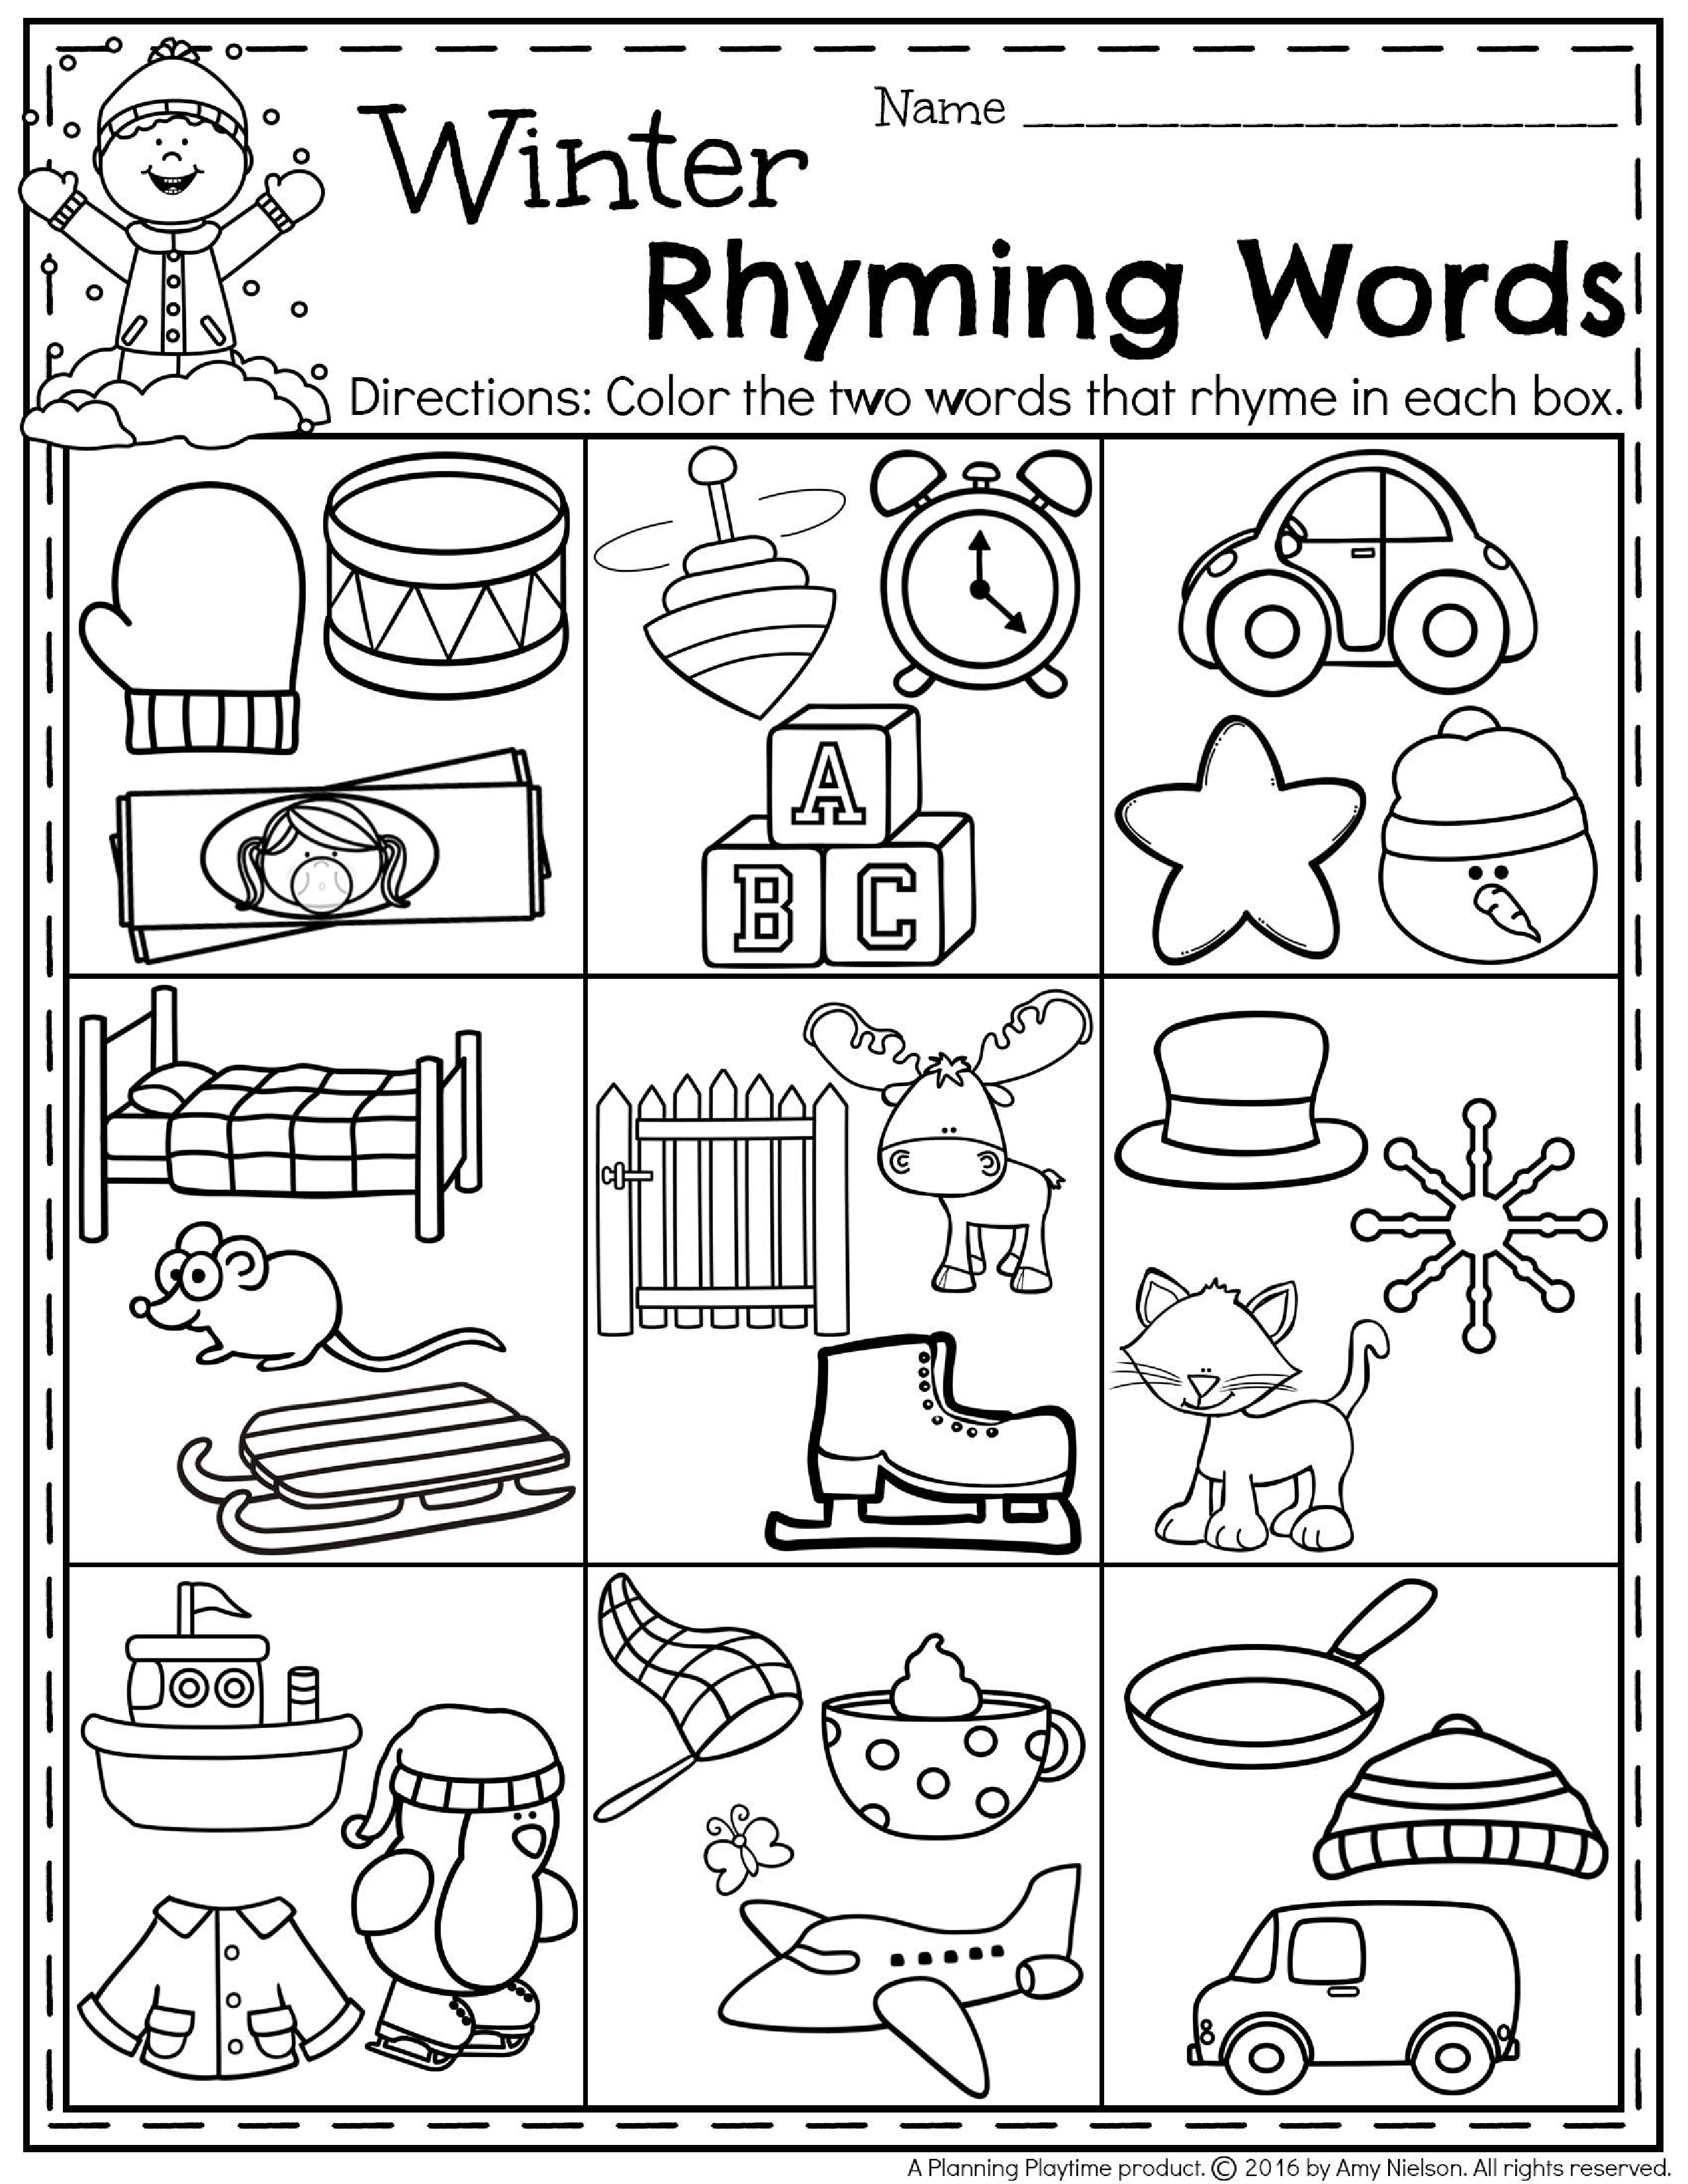 Preschool Worksheet   Templates at allbusinesstemplates.com